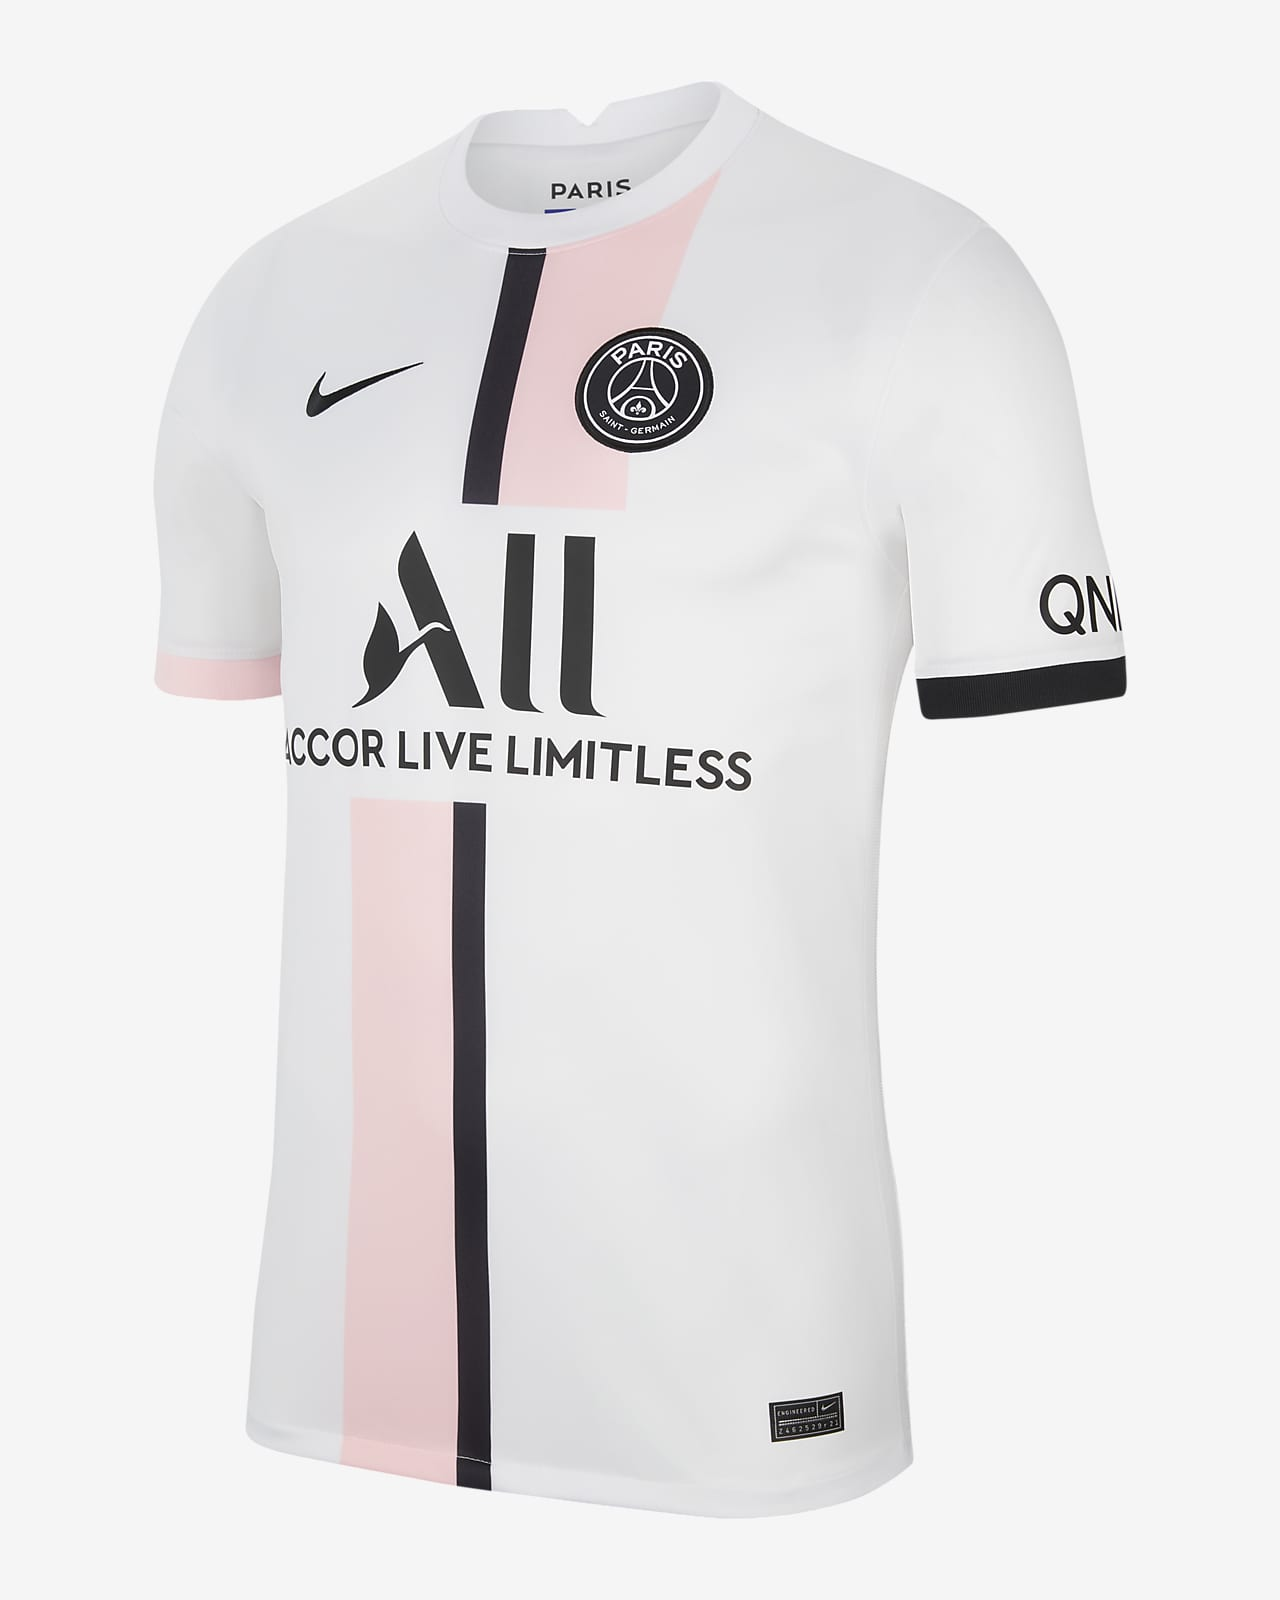 Paris Saint-Germain 2021/22 Stadyum Deplasman Nike Dri-FIT Erkek Futbol Forması